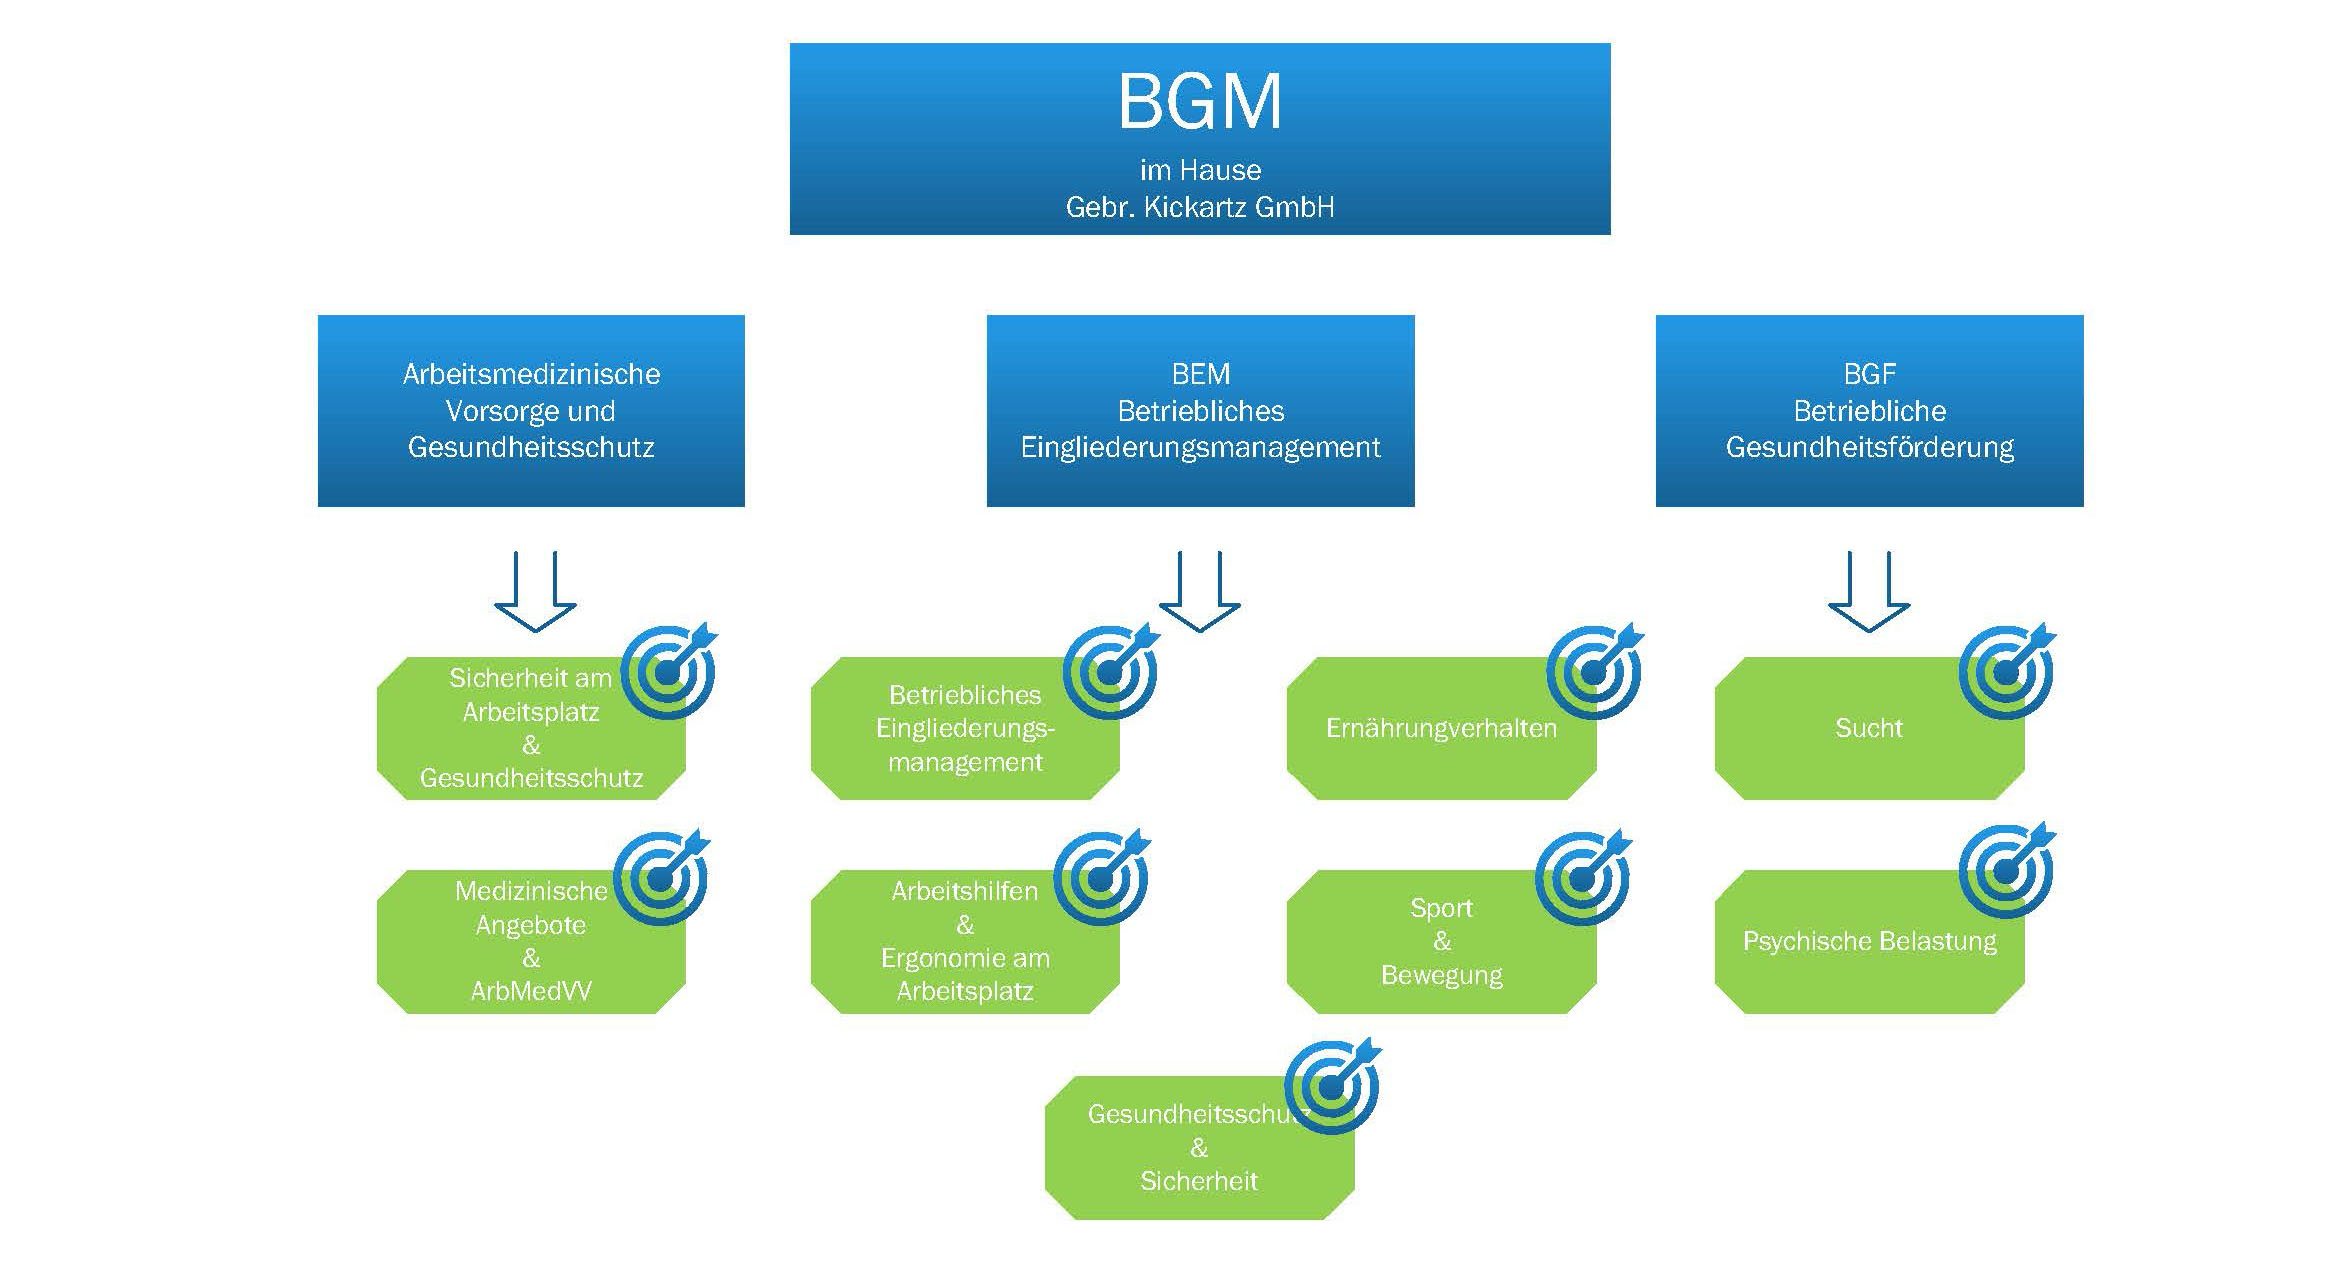 BGM im Hause Gebr. Kickartz GmbH